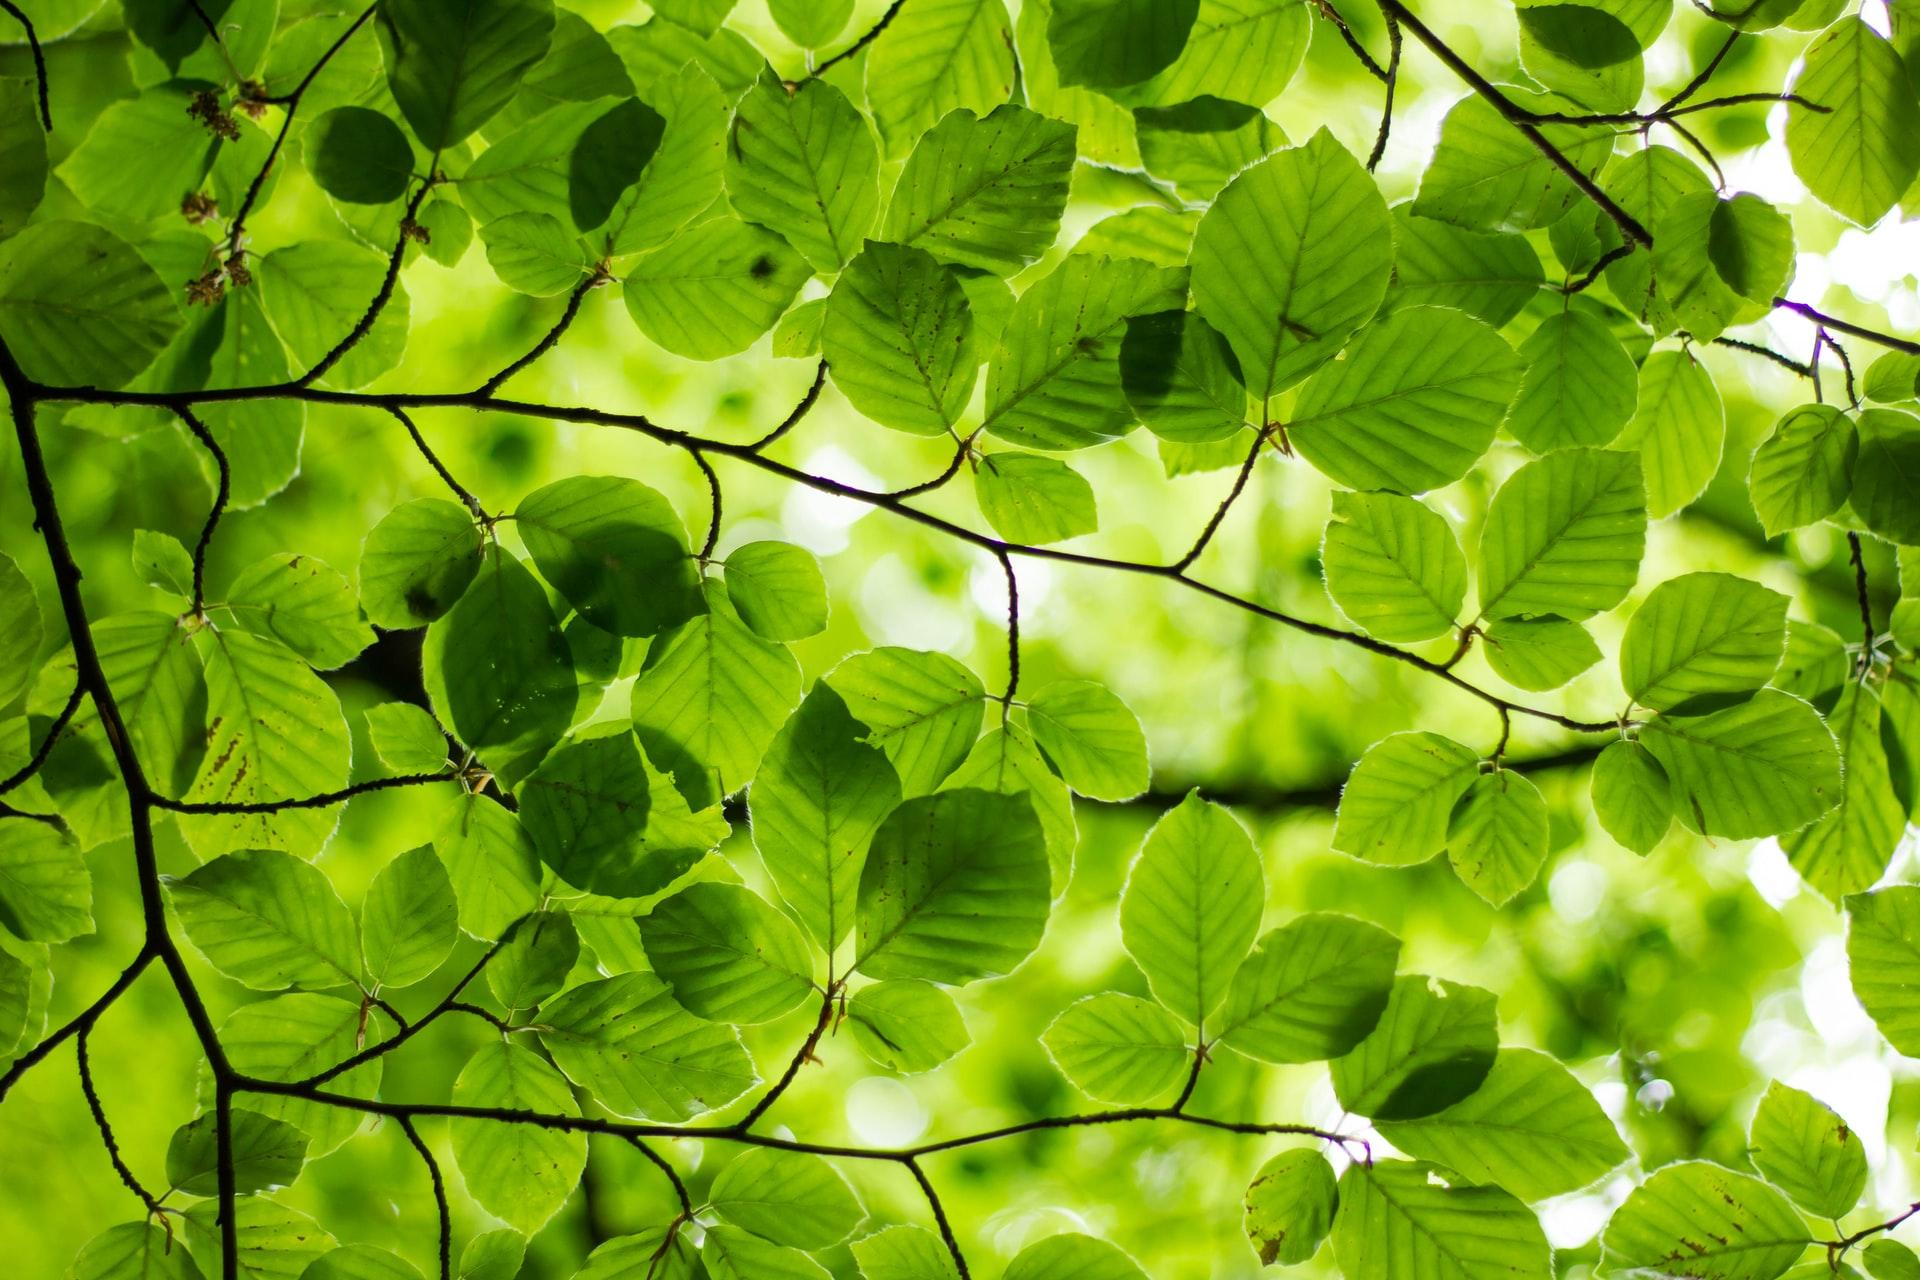 Green leaves symbolising spring